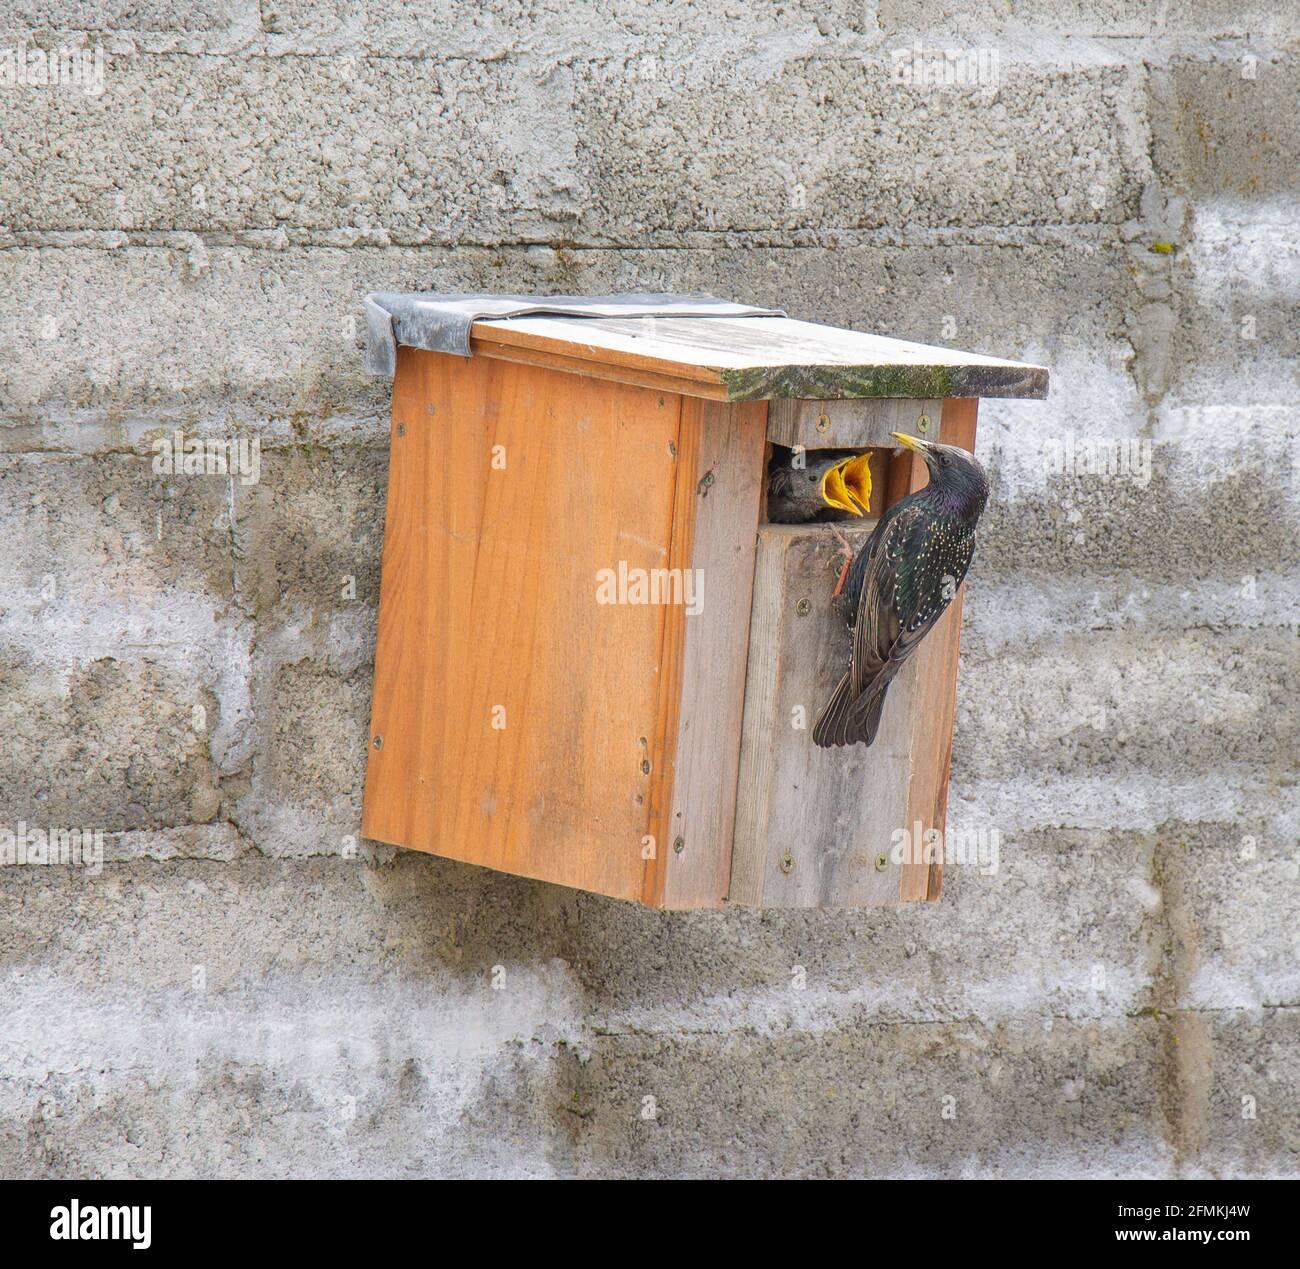 adult-european-starling-sturnus-vulgaris-feeding-chicks-at-nest-box-2FMKJ4W.jpg